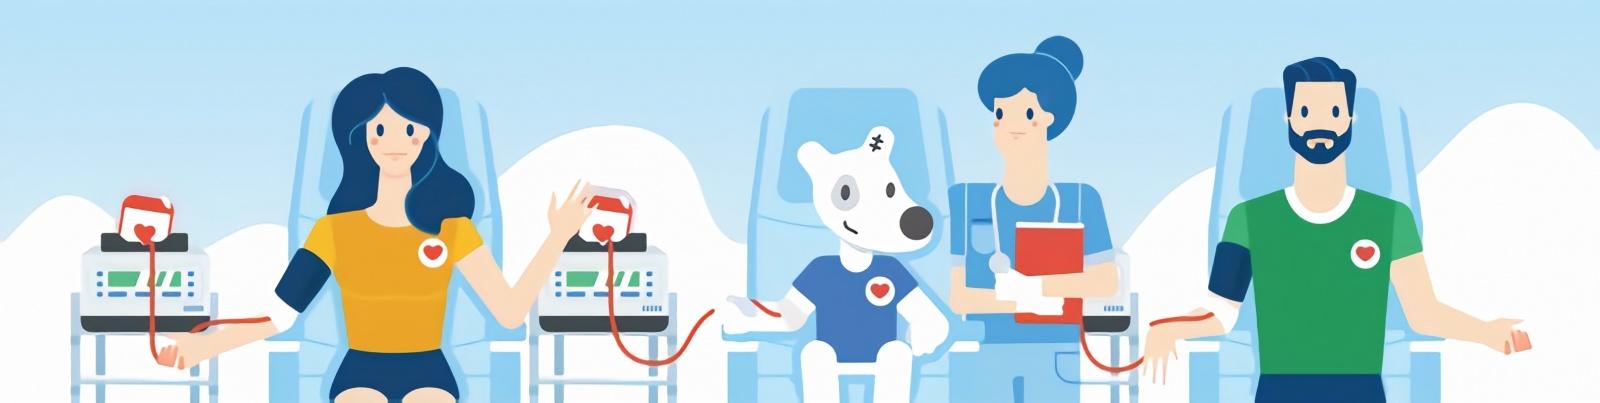 Опыт DonorSearch в привлечении молодежи на сдачу крови посредством геотаргетинга ВКонтакте - 1